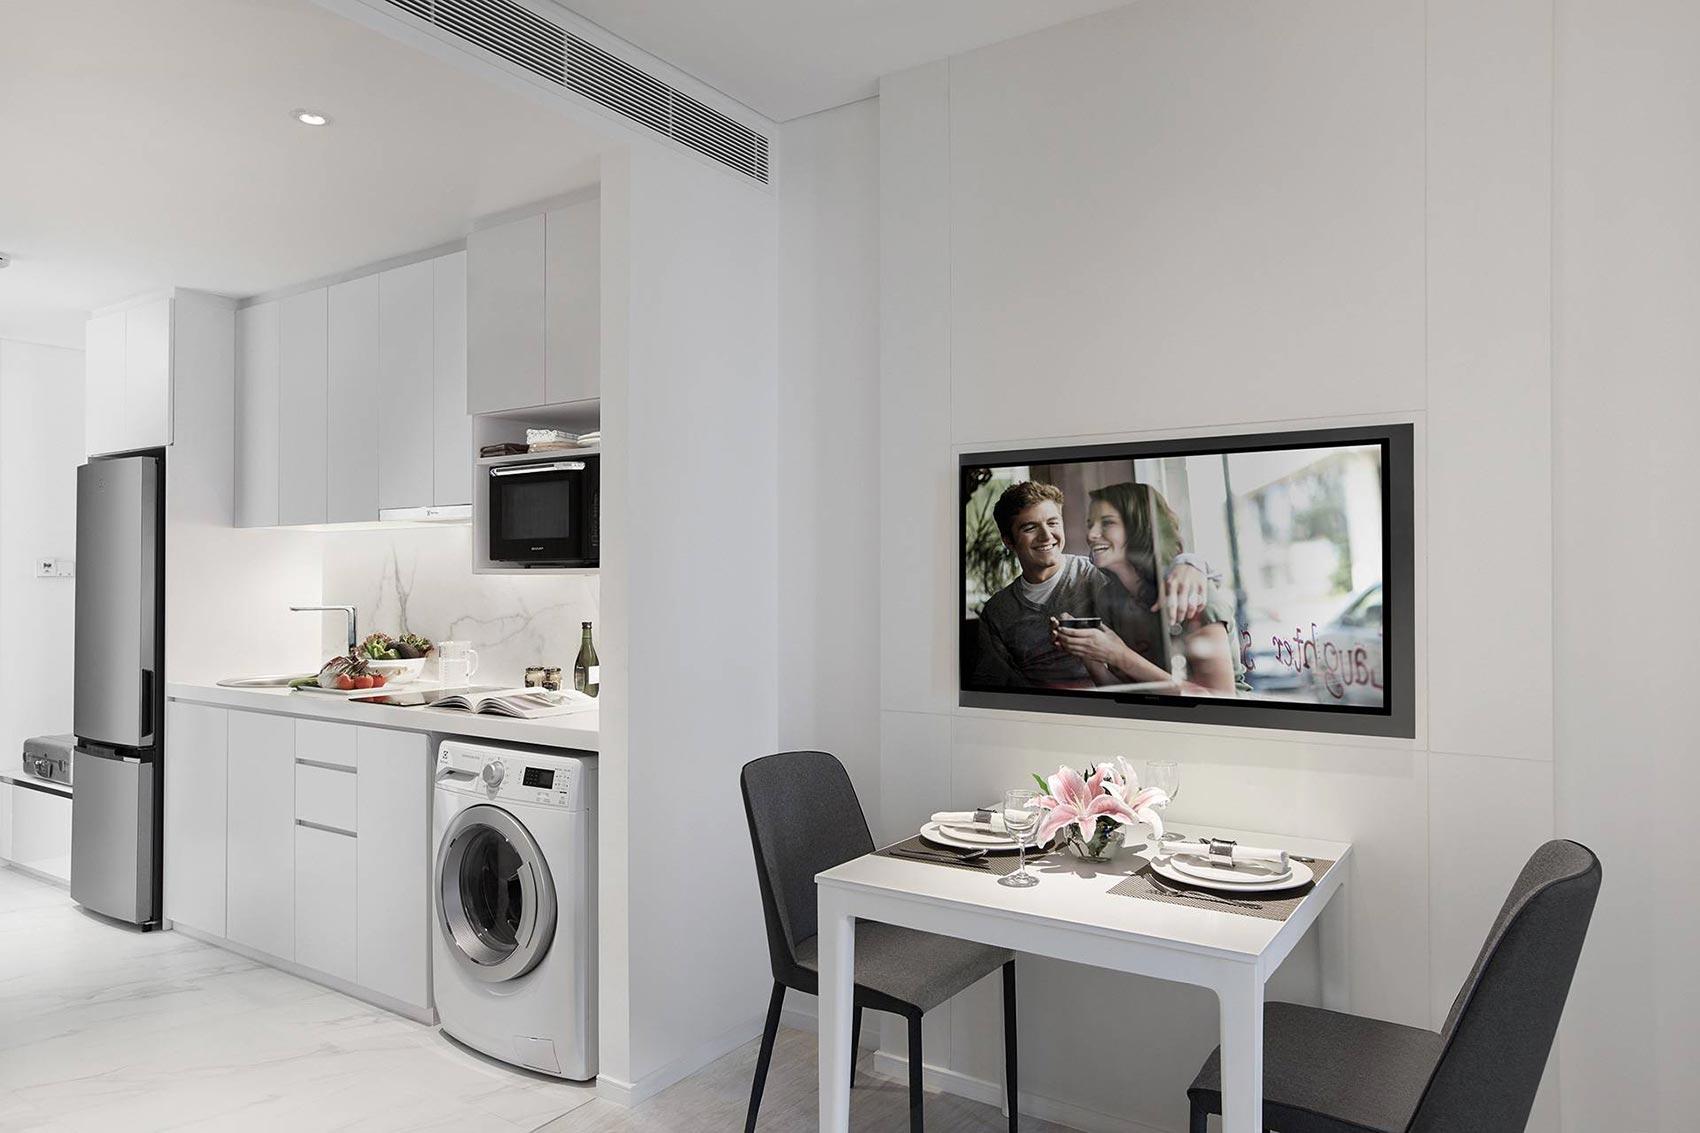 Somerset Maison Asoke kitchenette